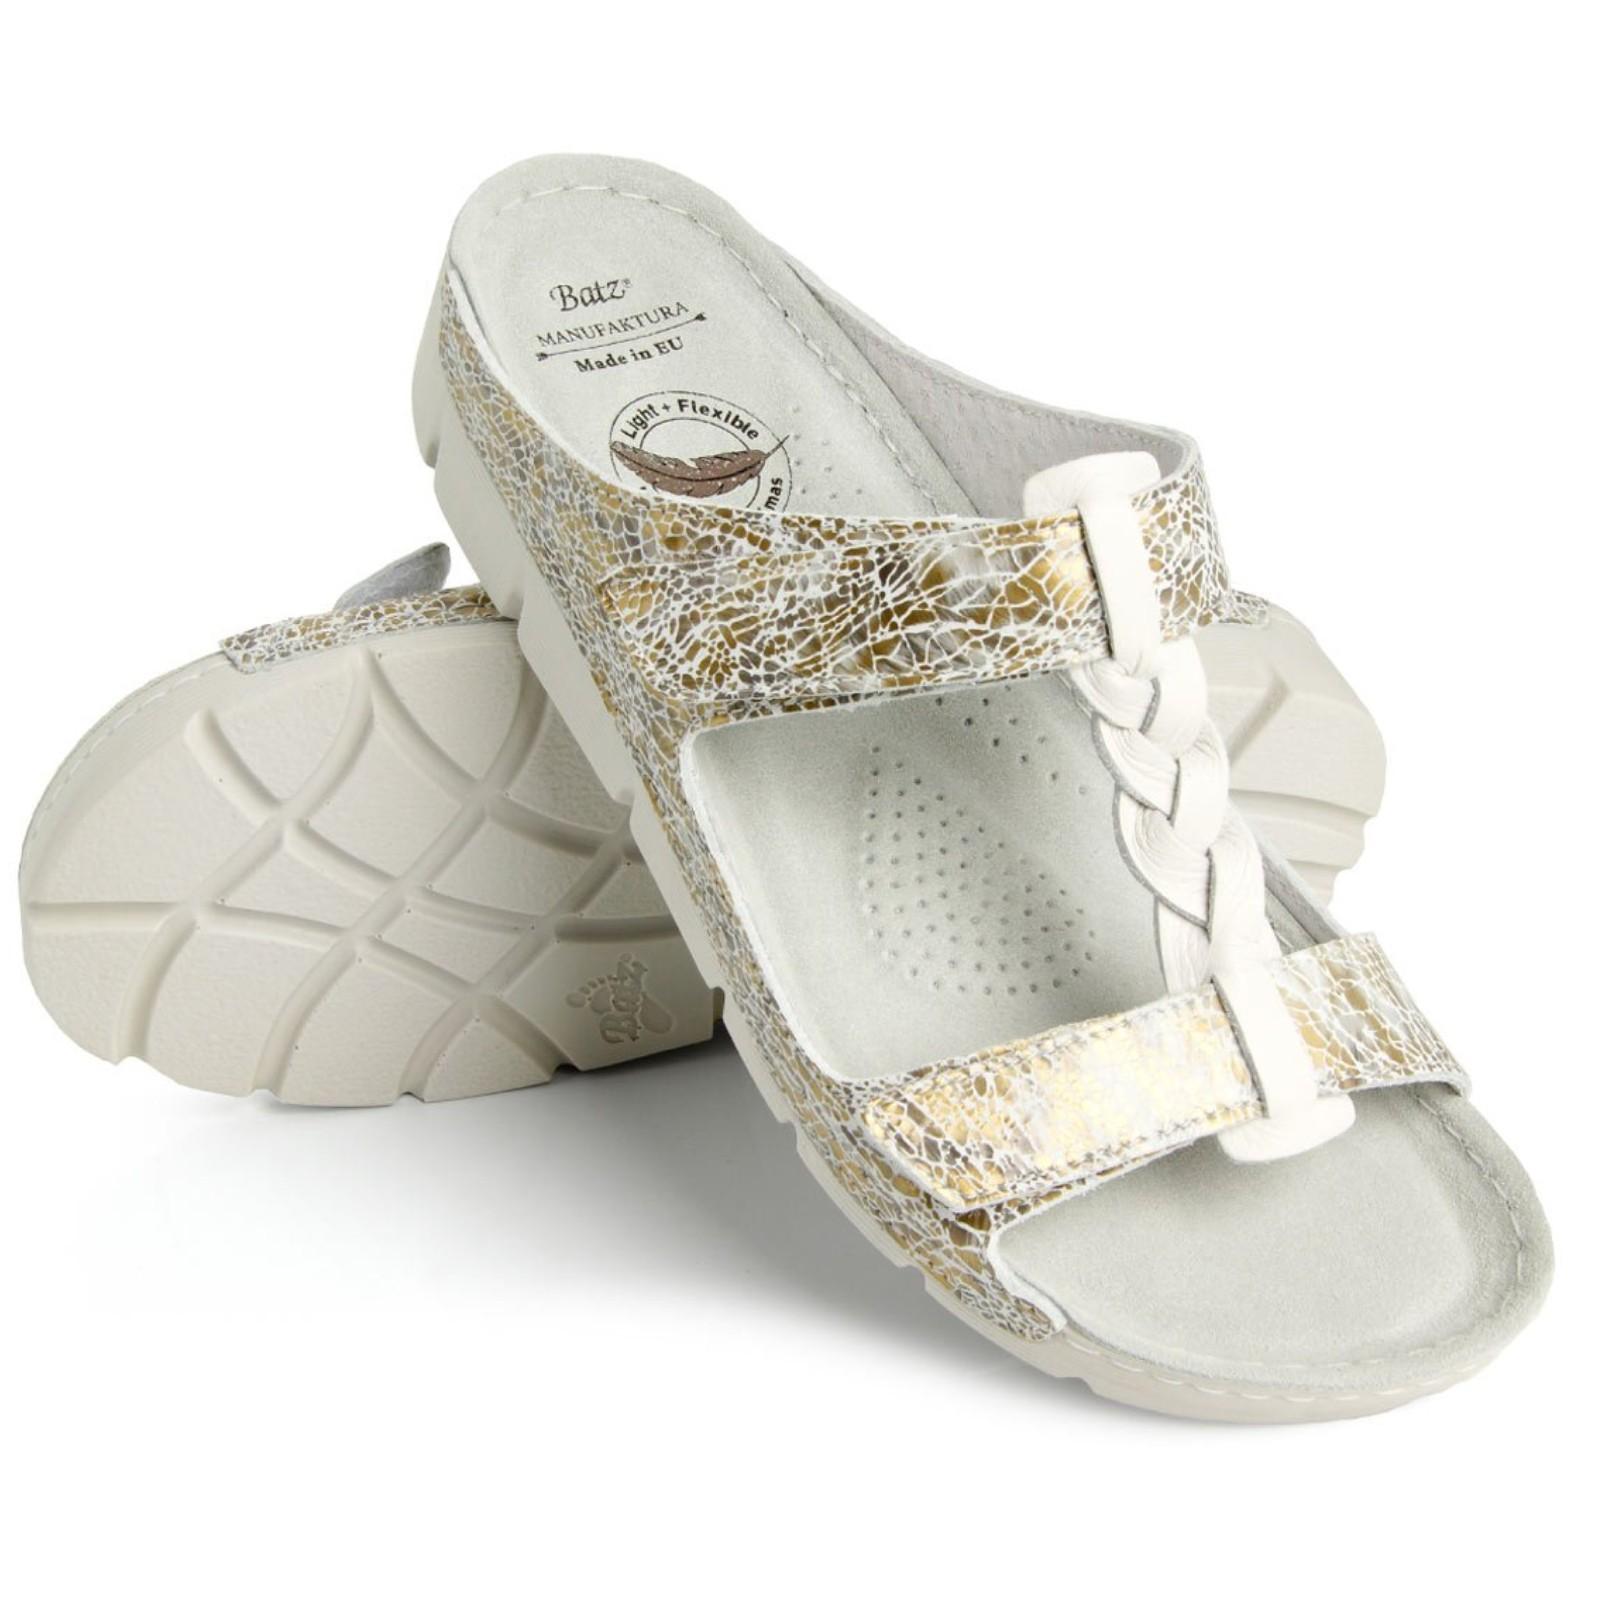 Batz Bori arany mix női papucs - Női papucs e605b008be